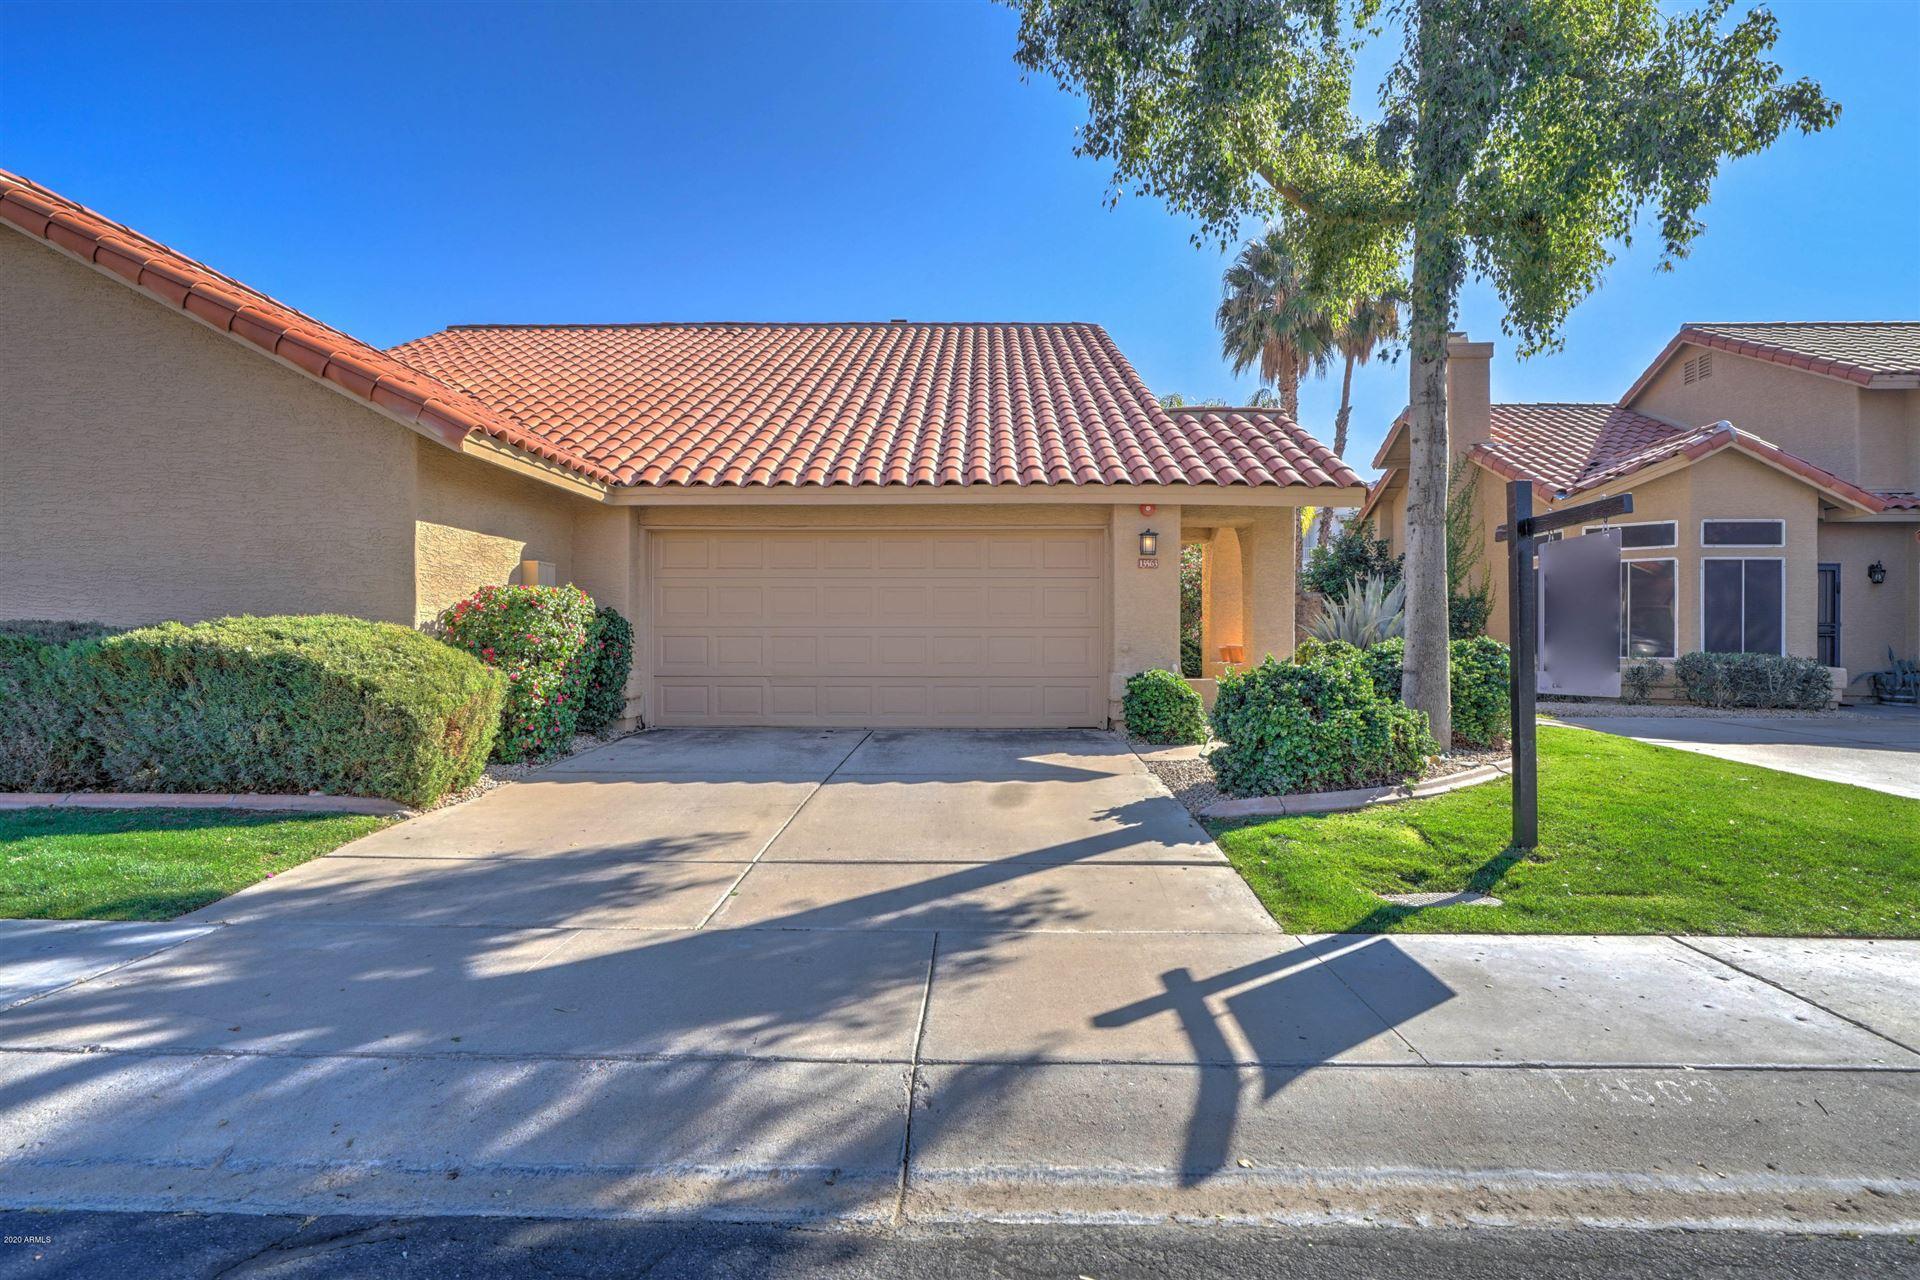 13563 N 92ND Way, Scottsdale, AZ 85260 - #: 6037204